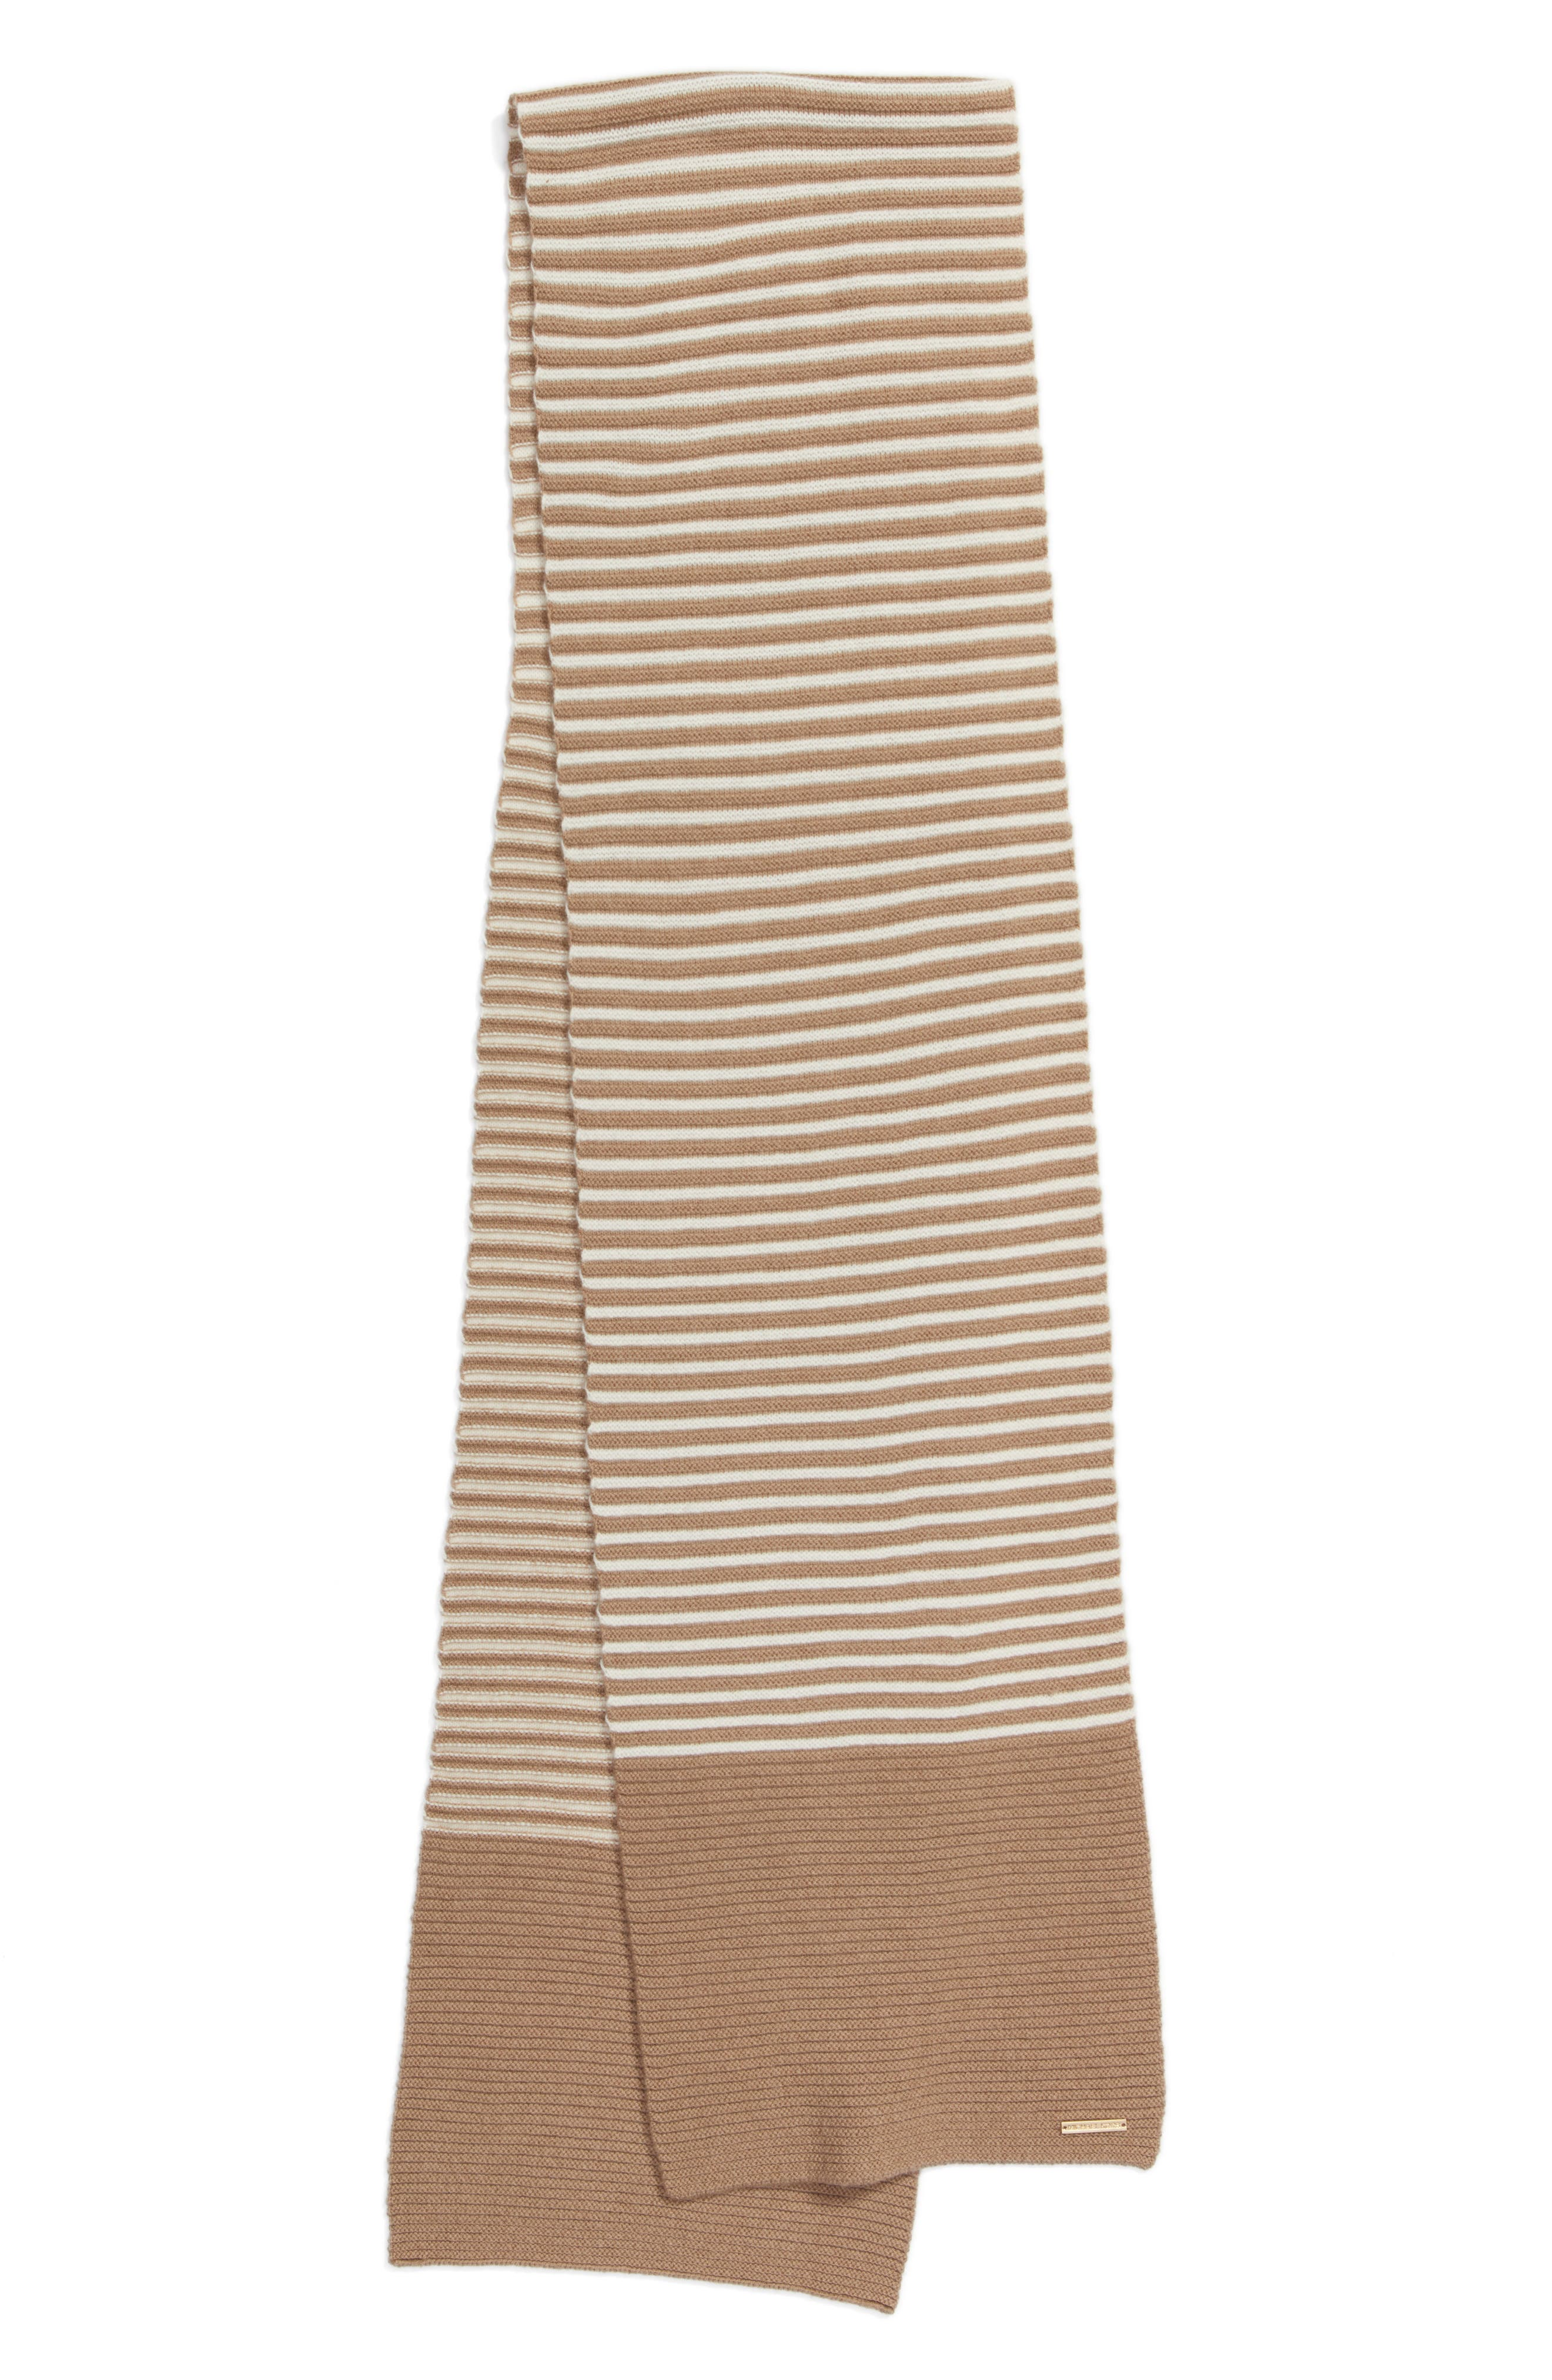 Alternate Image 2  - MICHAEL Michael Kors Double Links Wool & Cashmere Scarf